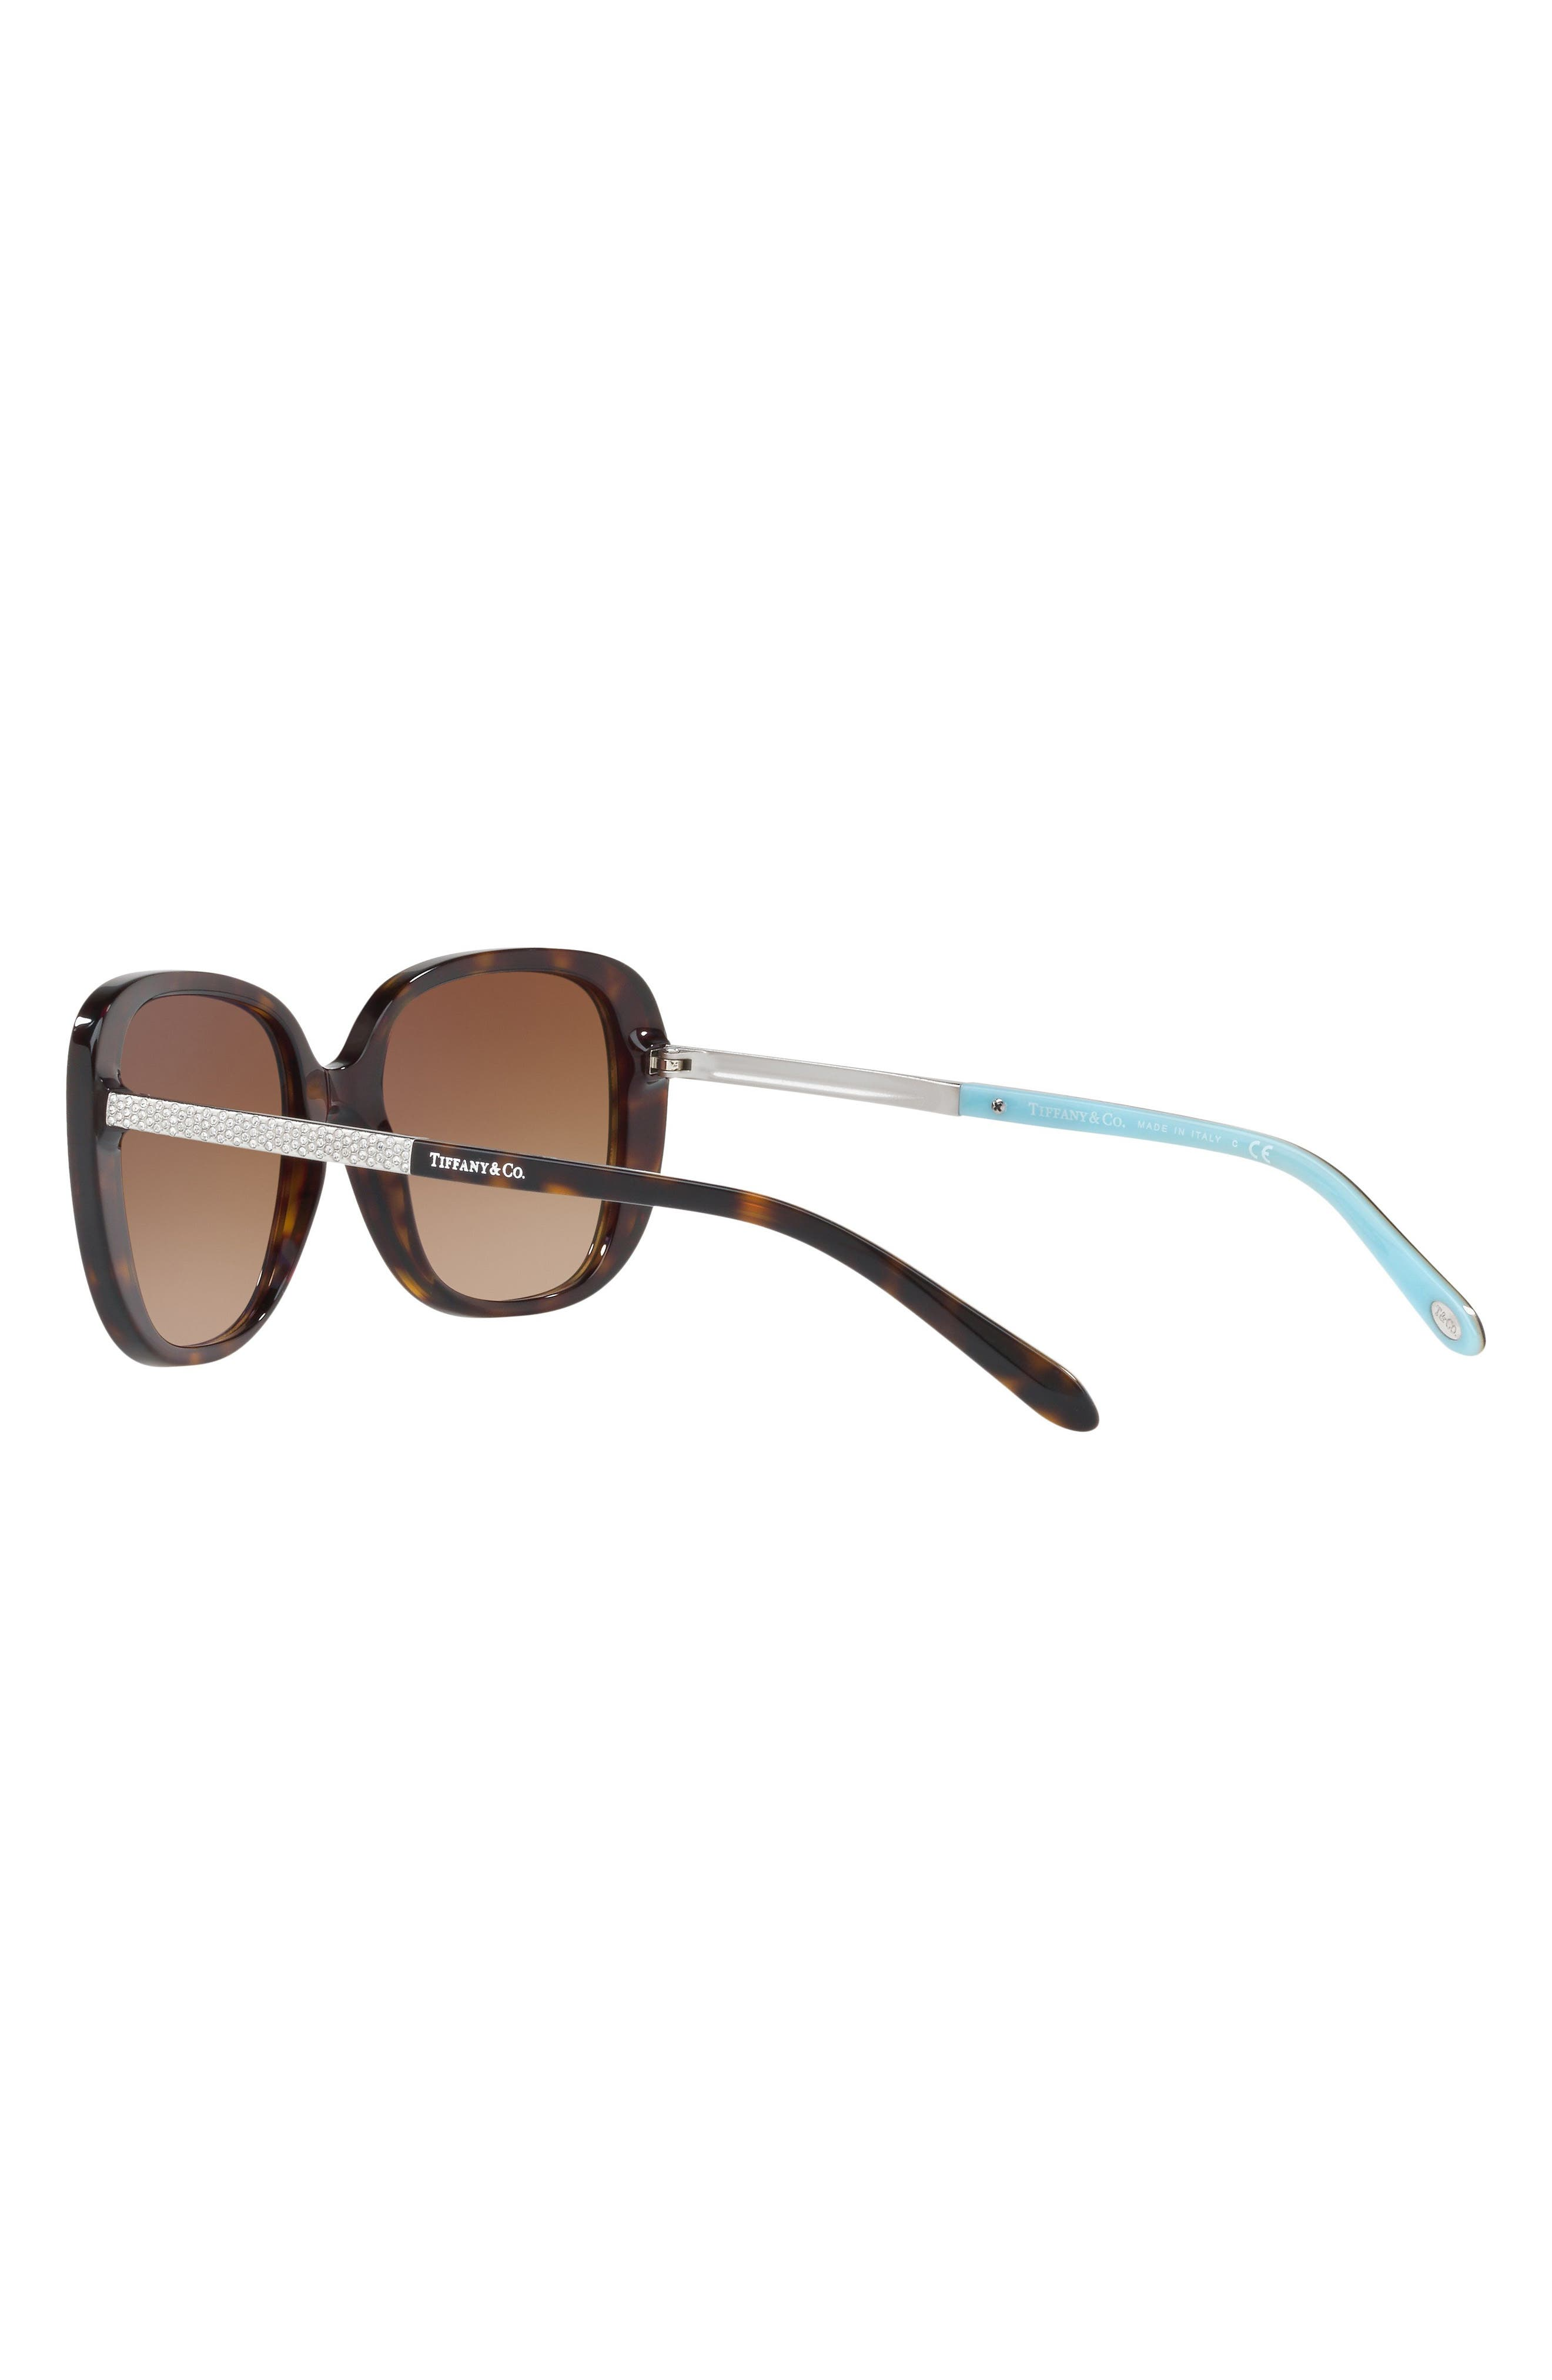 54mm Gradient Sunglasses,                             Alternate thumbnail 3, color,                             Dark Havana